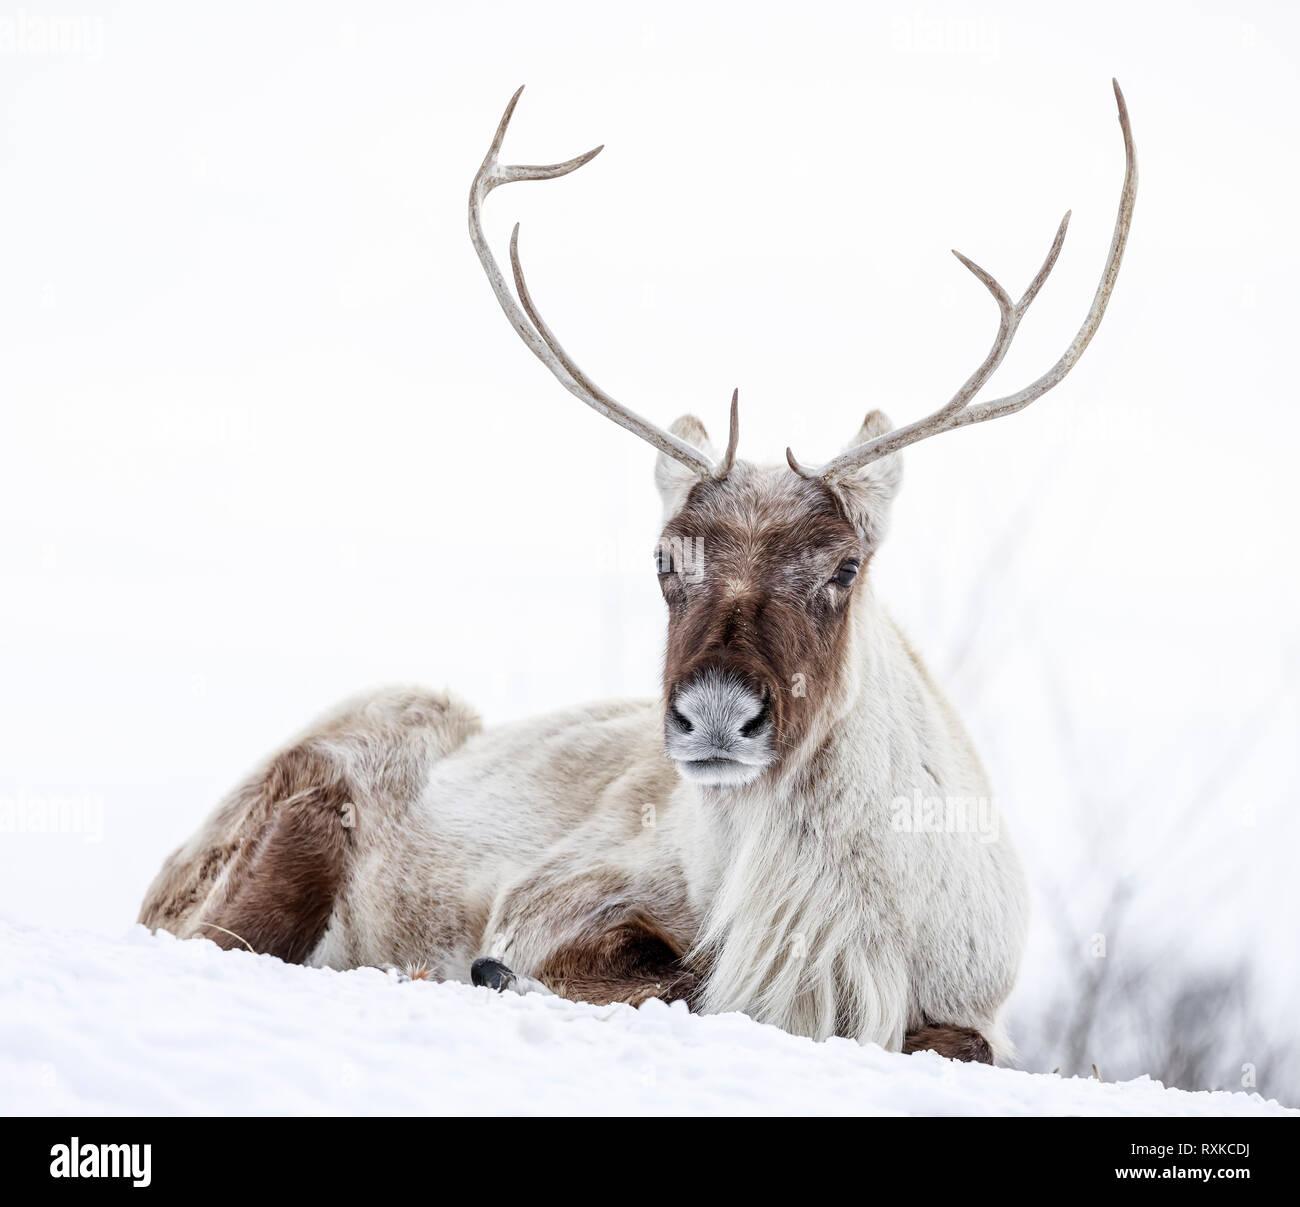 Boreal Woodland Caribou, Rangifer tarandus, in winter, captive animal, Manitoba, Canada - Stock Image